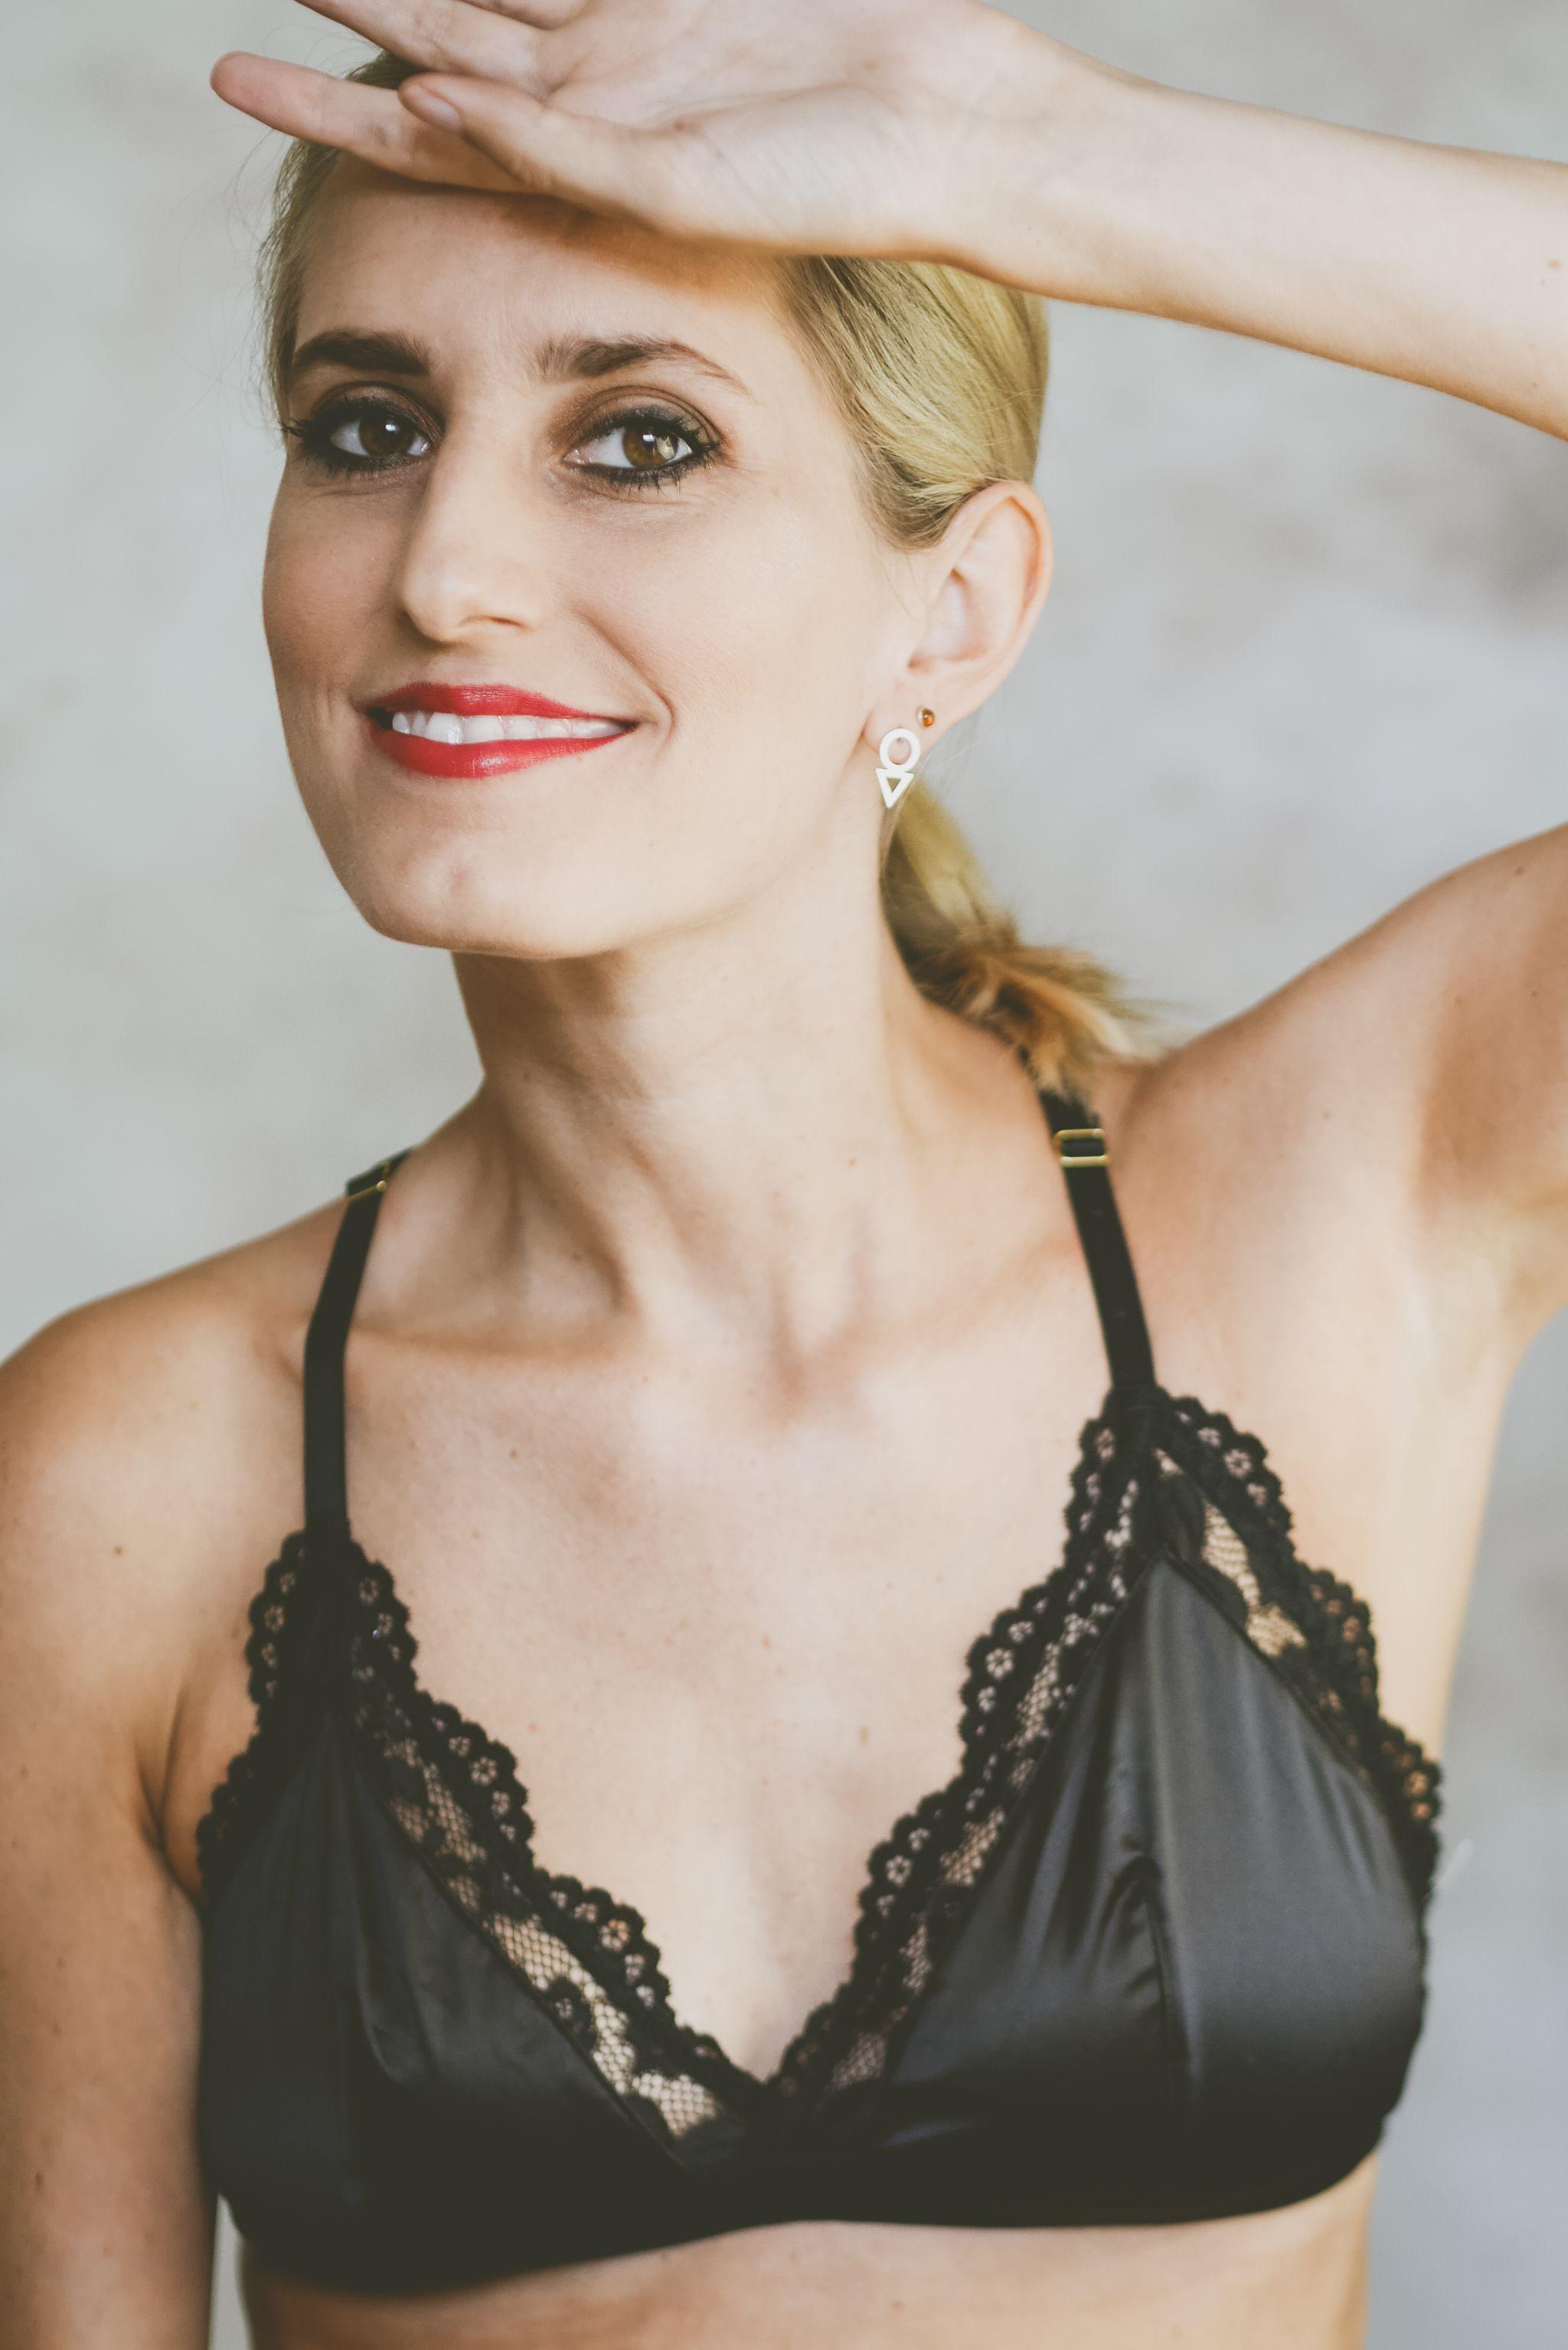 Malibu 2018 >> New Look Black Bra - Sophie Eggleton (20 of 30) - Sophie Eggleton